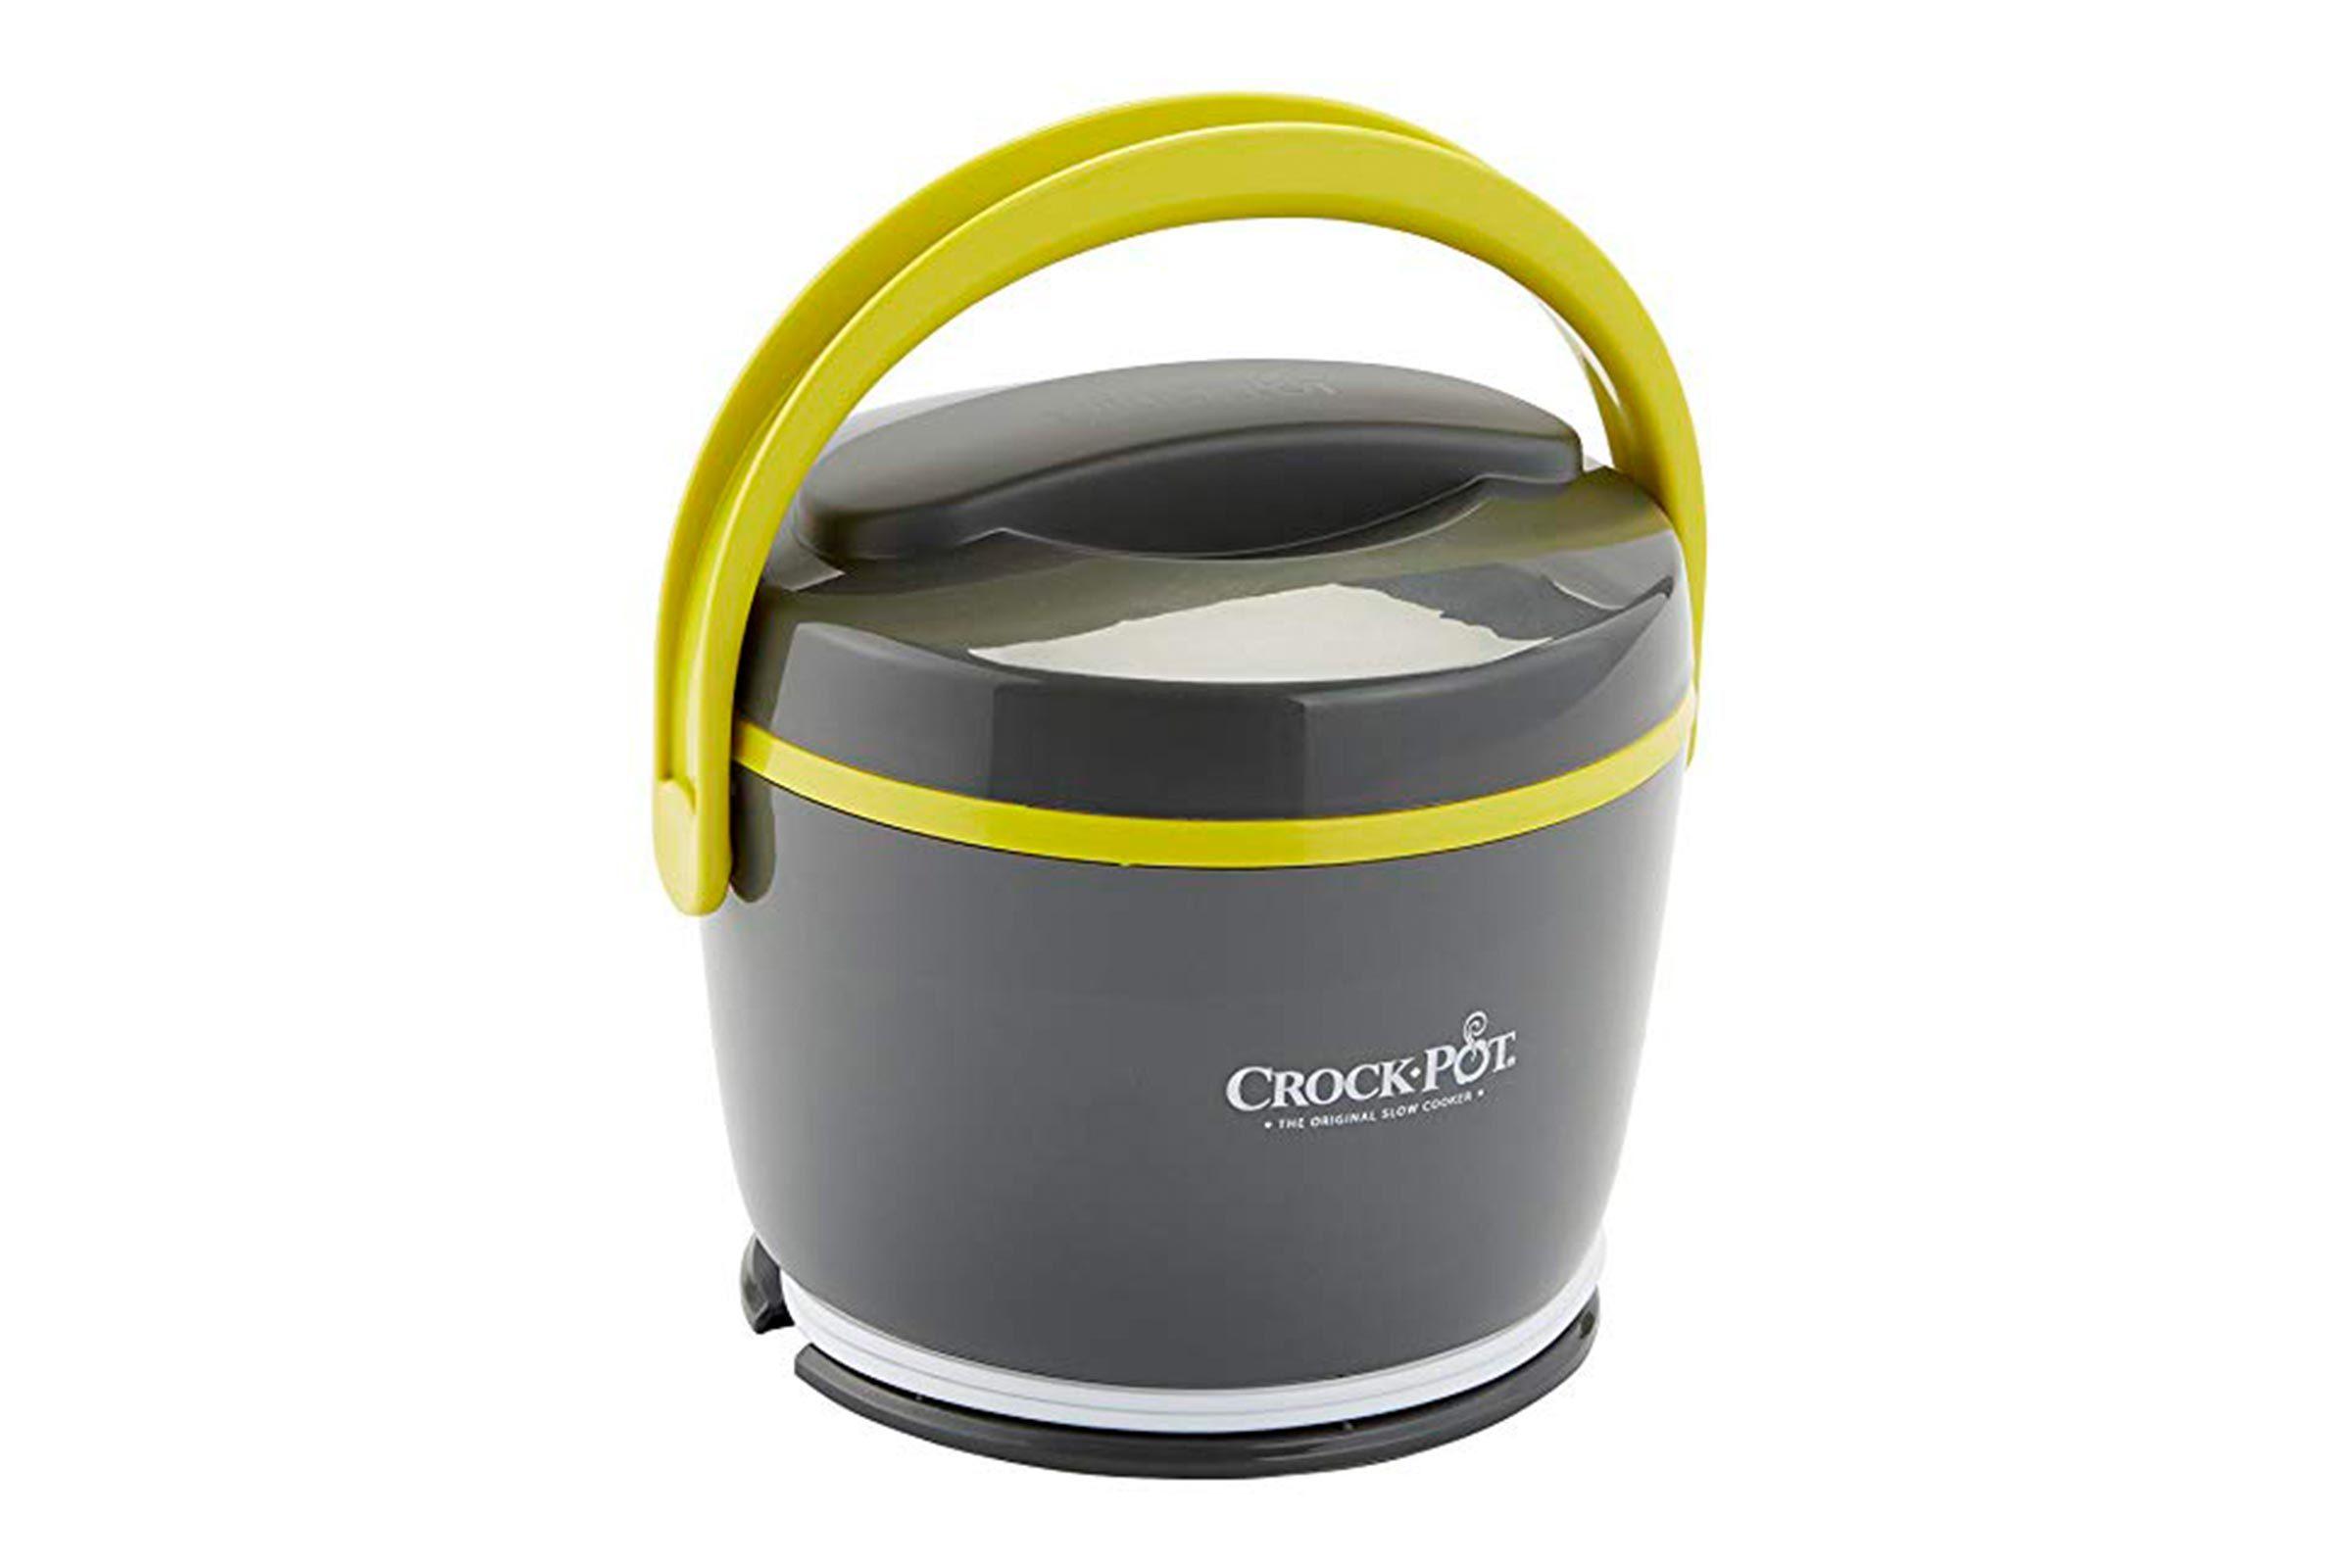 Crock pot food warmer